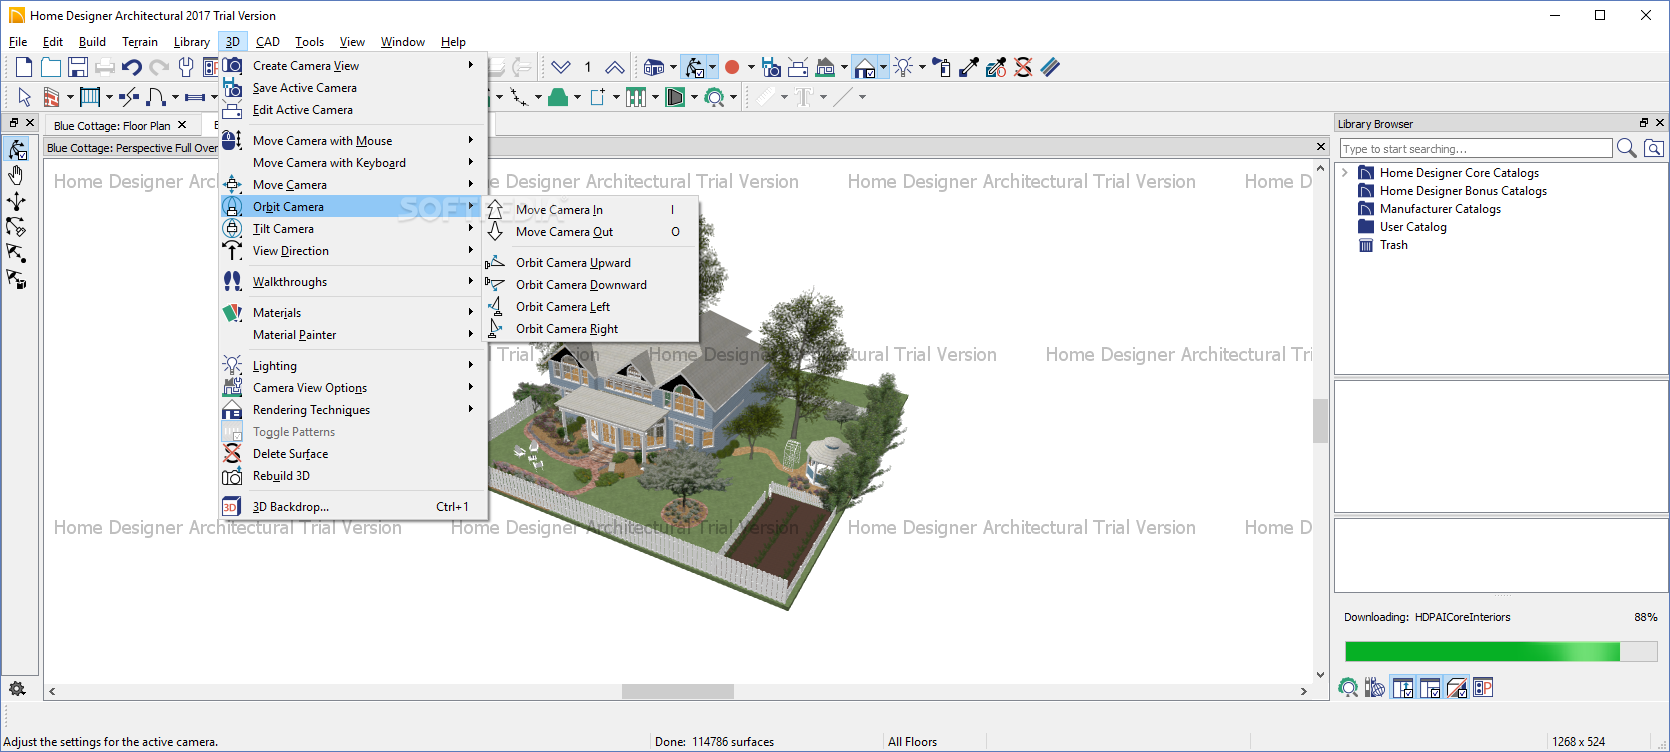 Download Home Designer Architectural 2019 20.3.0.54